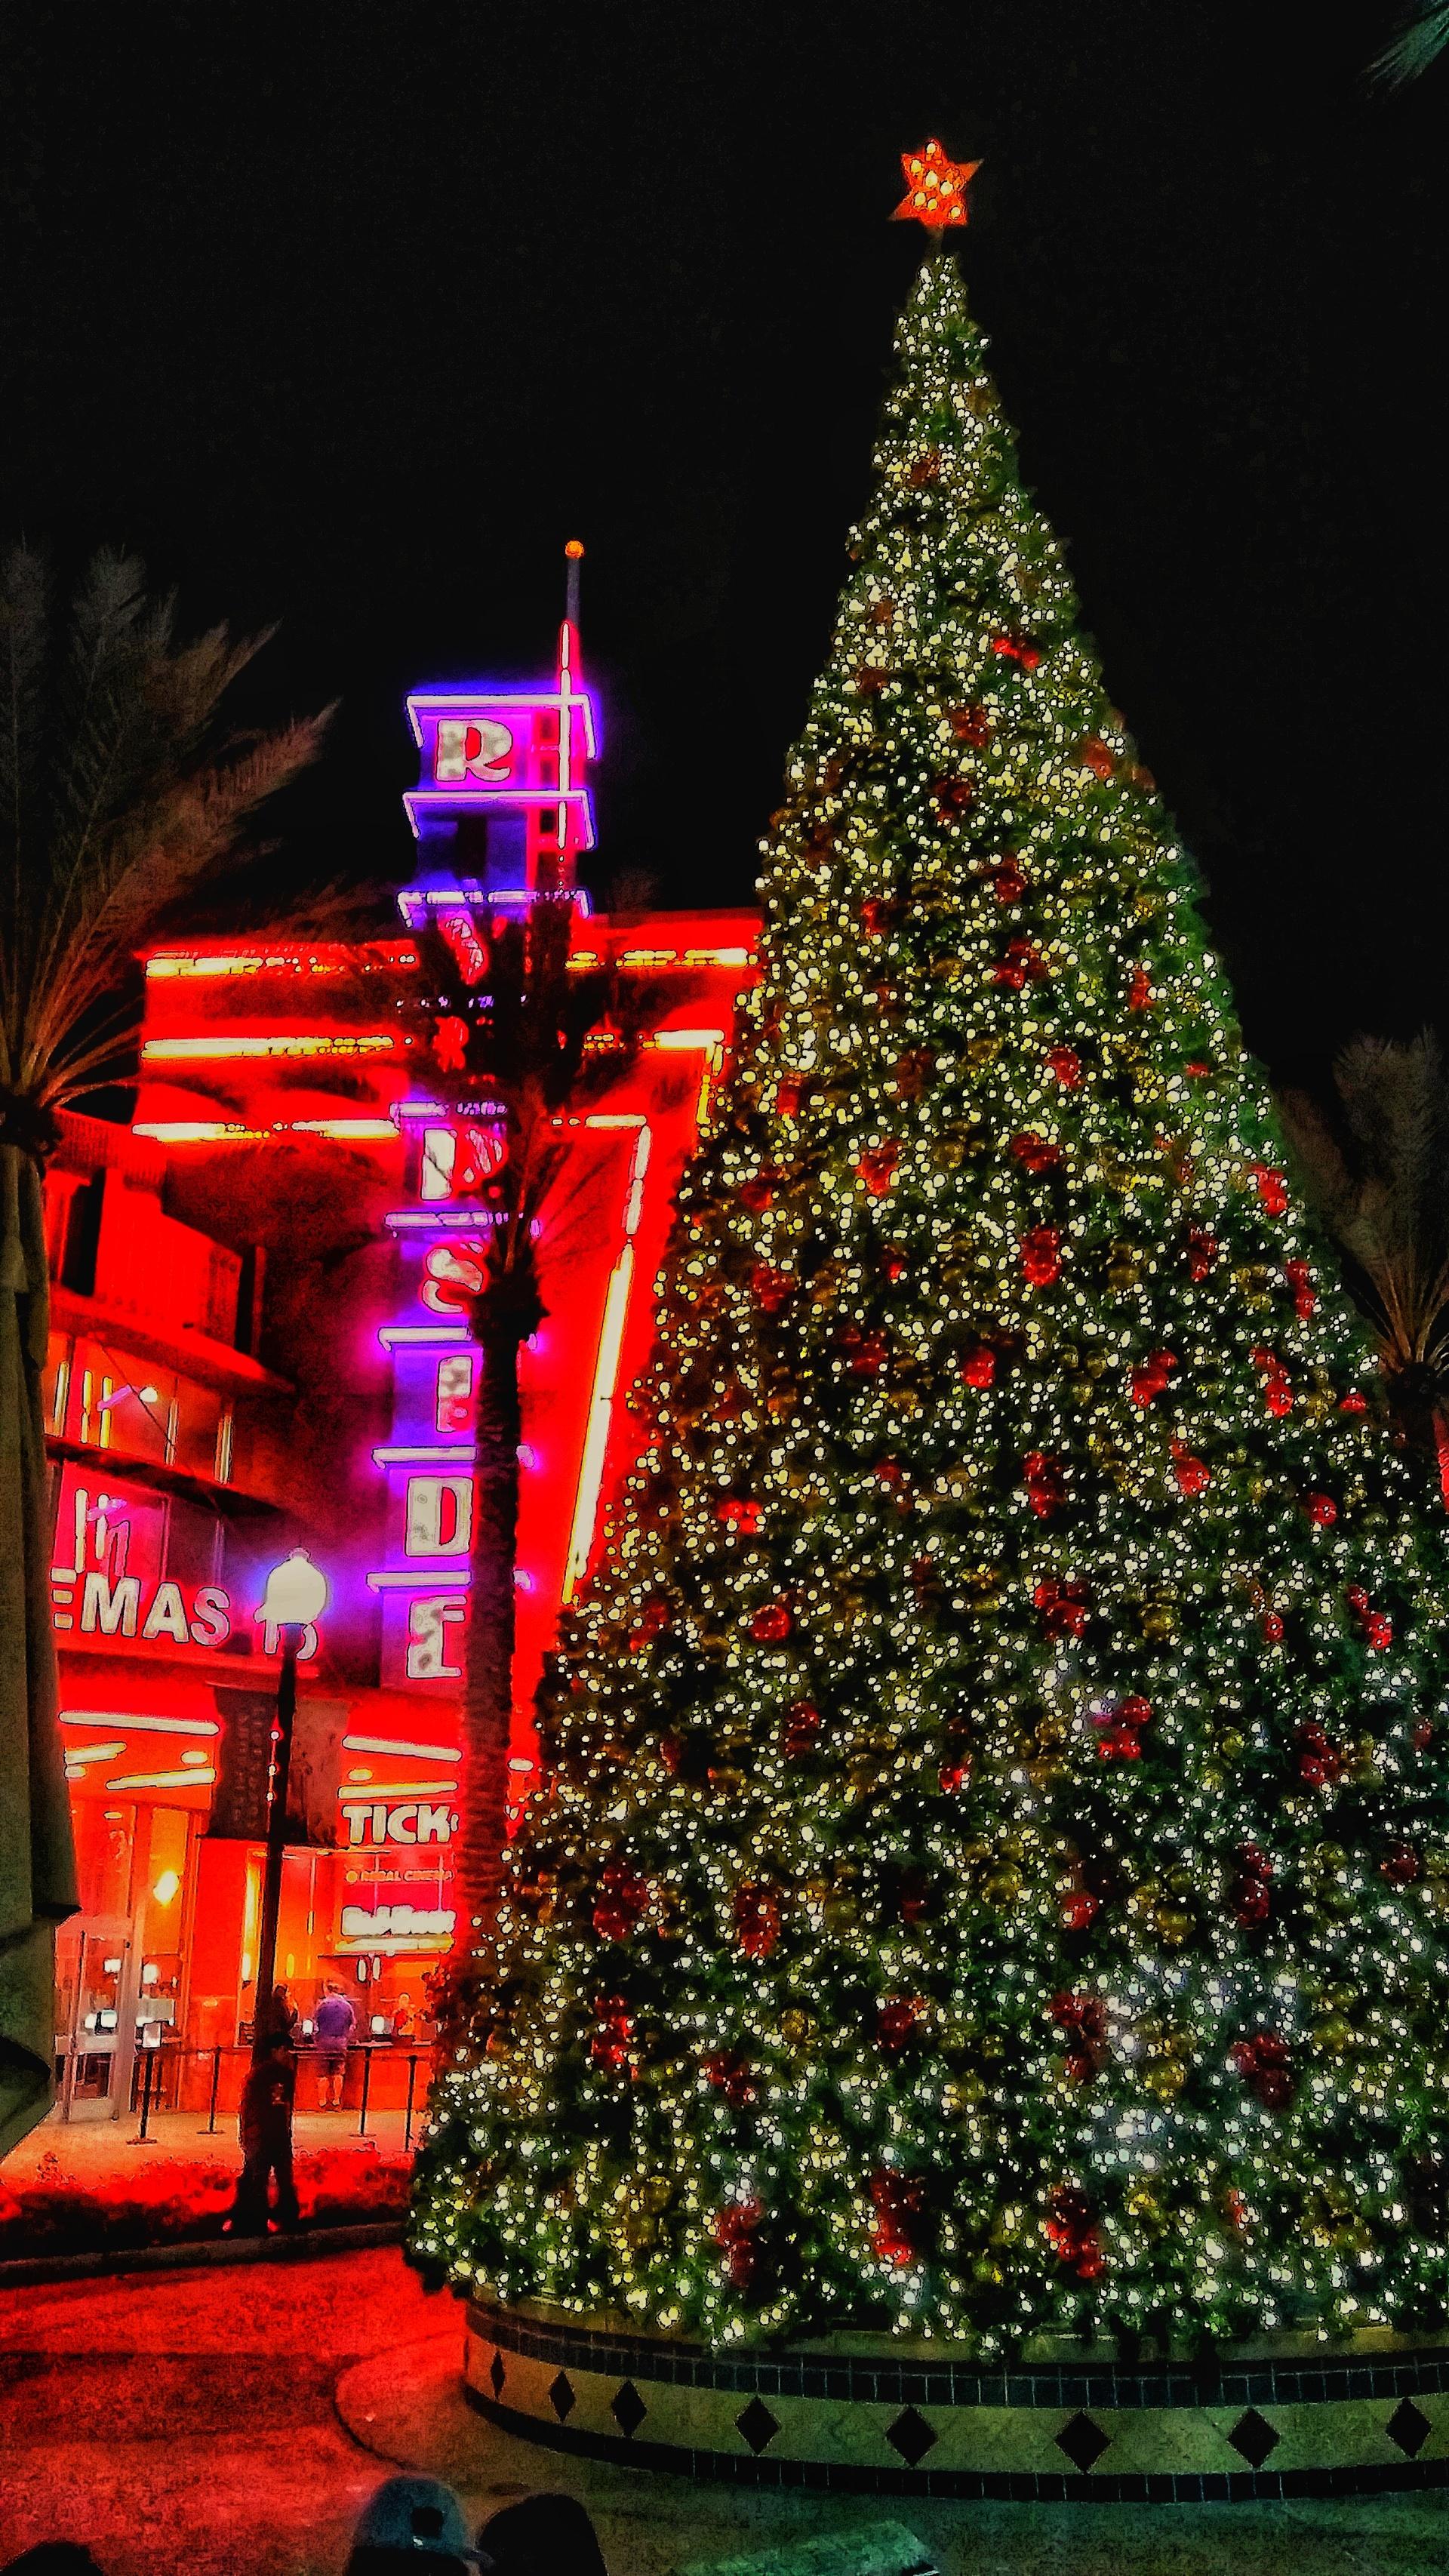 Christmas Riverside | brad_from_riverside, Christmas tree, no person, celebration